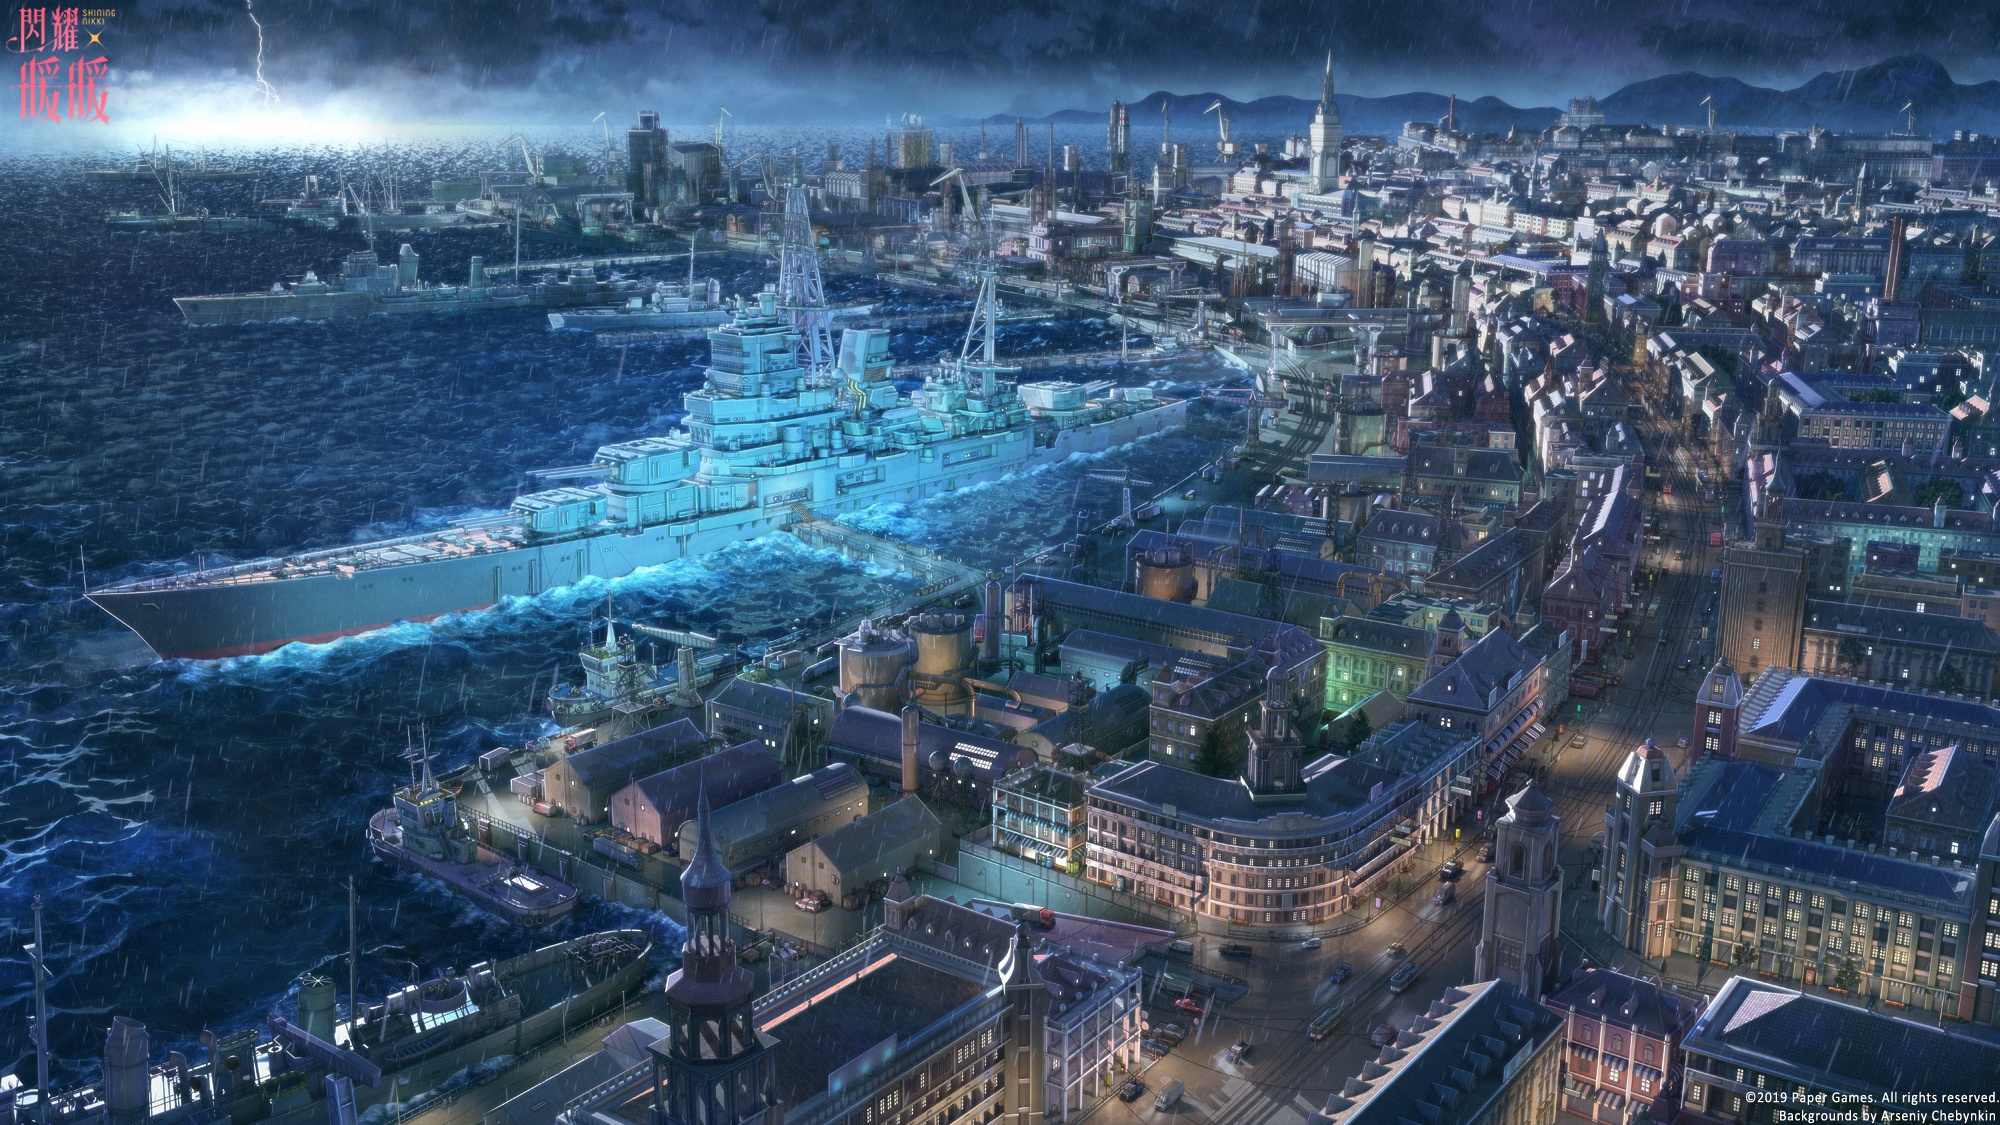 Anime City 1080p wallpaper